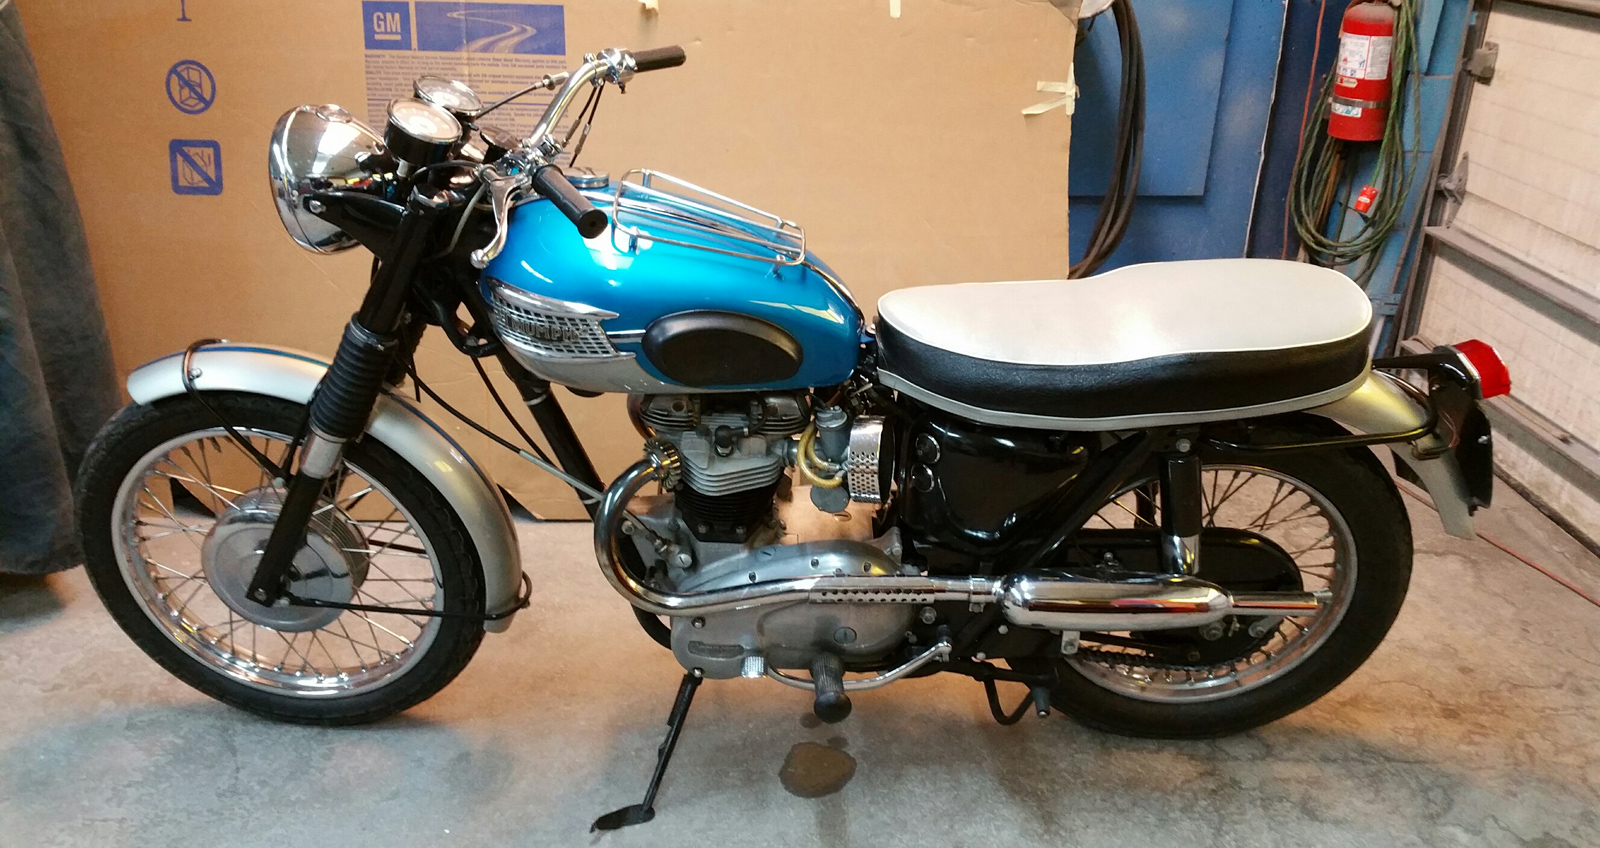 Vintage Motorcycle Restoration Sales Parts Service, MA RI ...